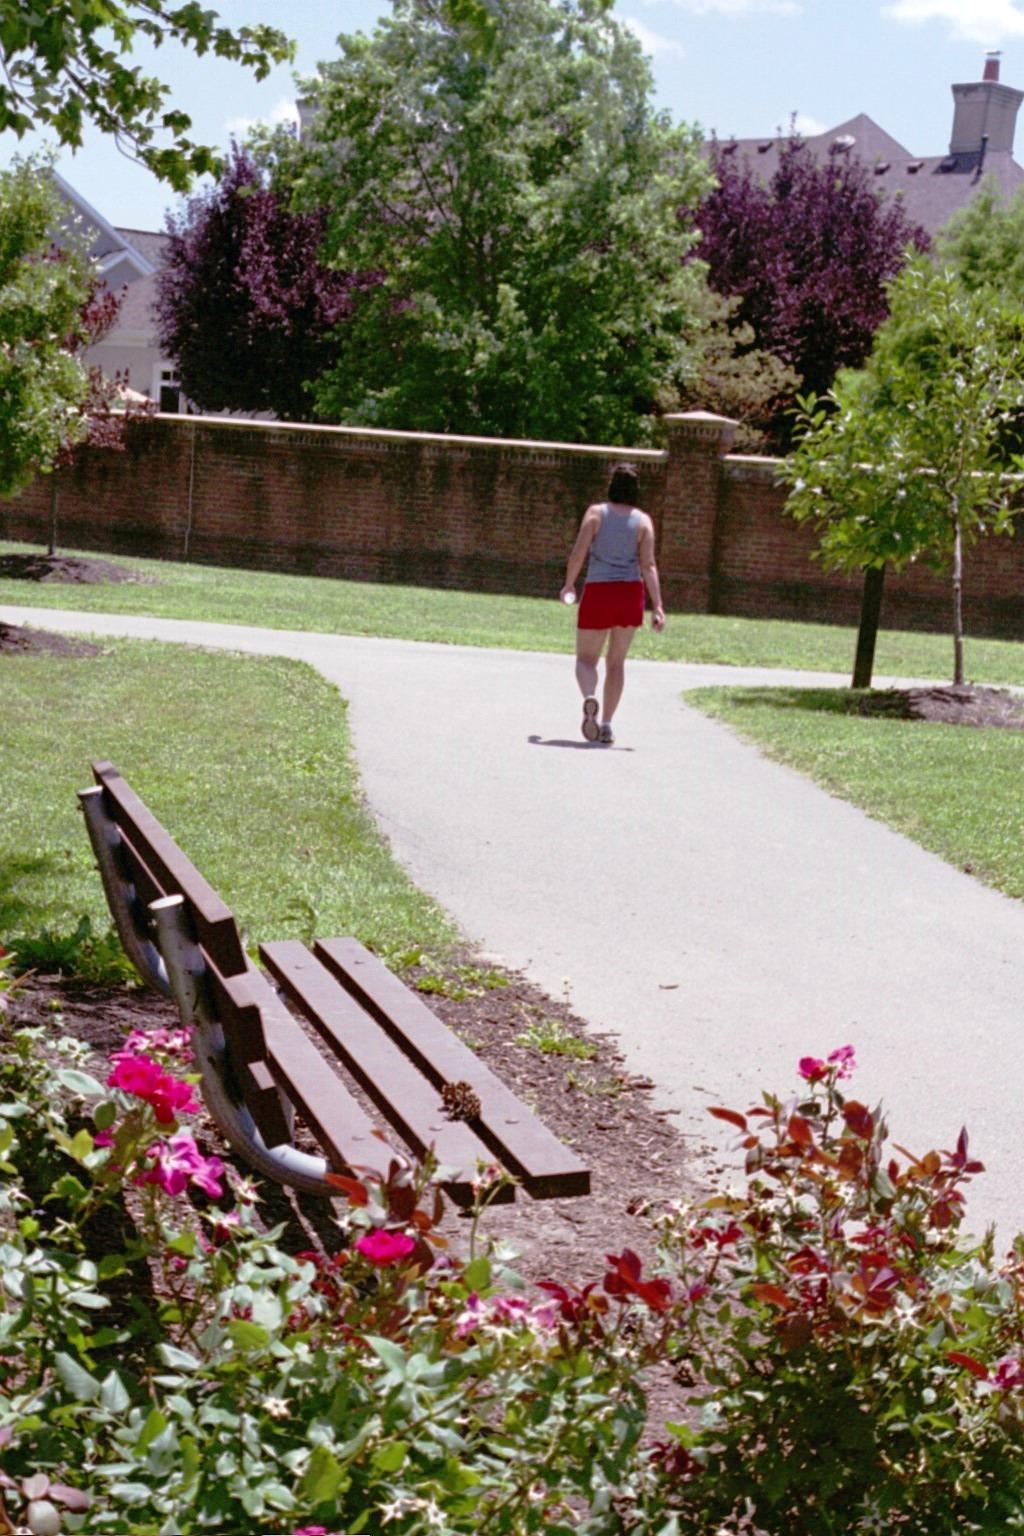 Weller Park - park    Photo 8 of 10   Address: 10021 Weller Rd, Montgomery, OH 45249, USA   Phone: (513) 891-2424